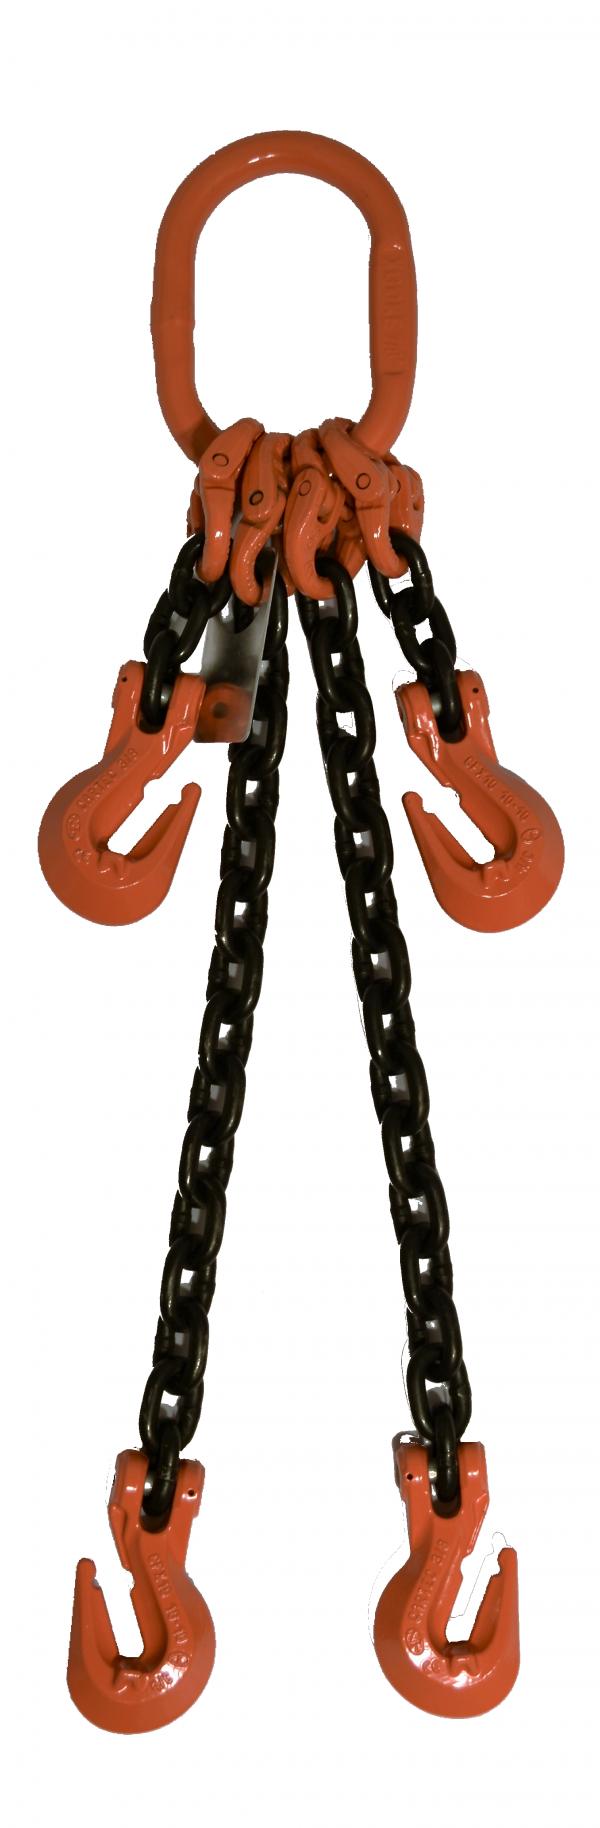 Adjustable 2 Leg With Grab Hook ADOG GR-100 Chain Sling